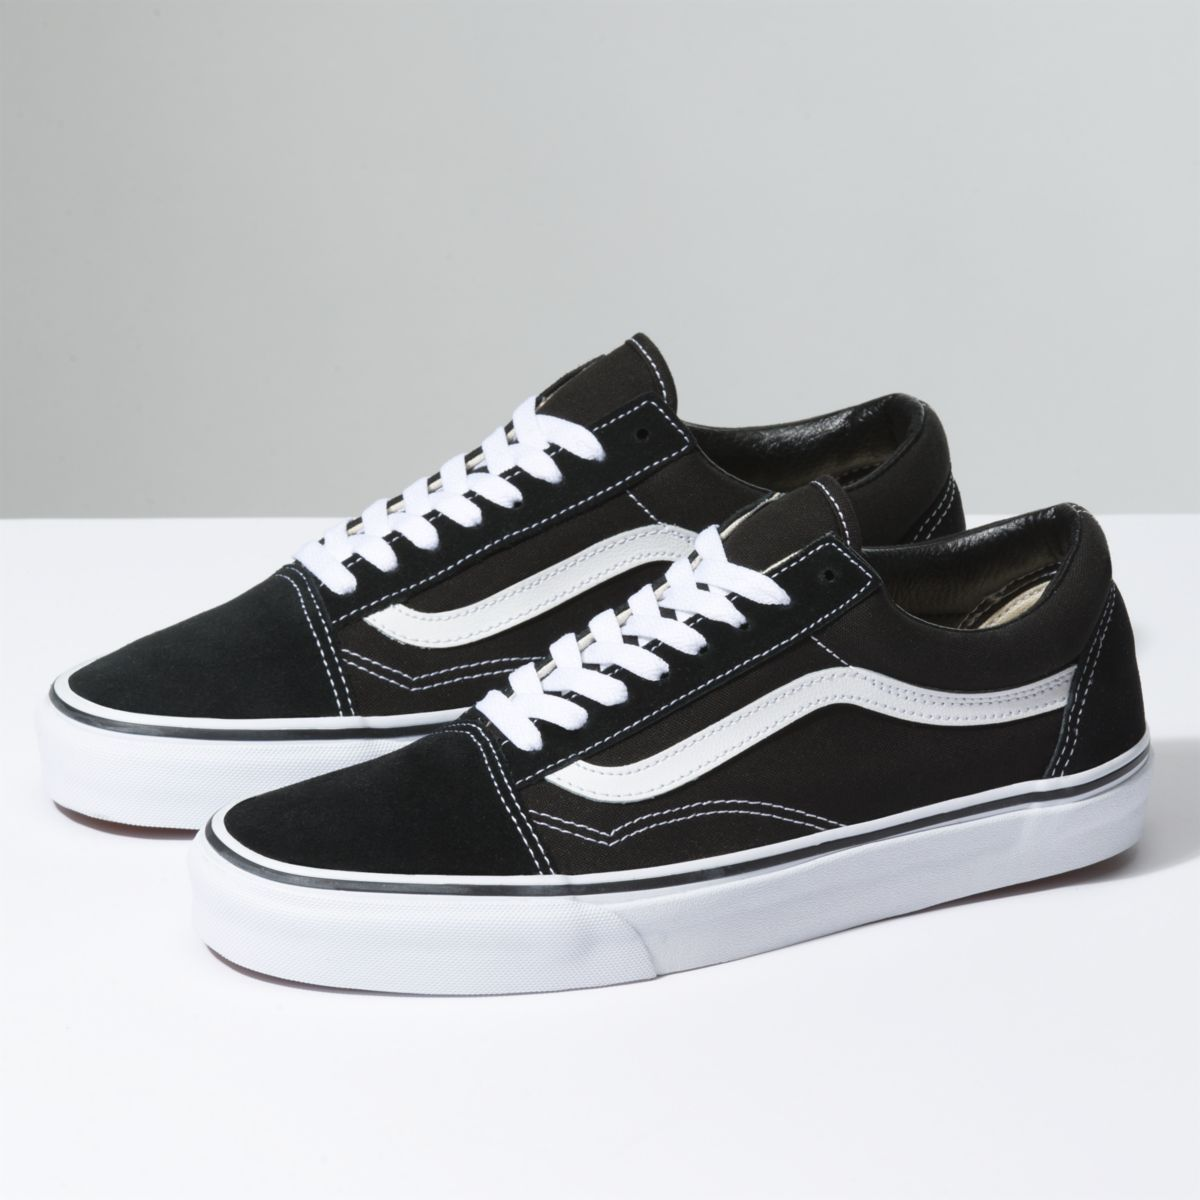 vans noir ligne blanche